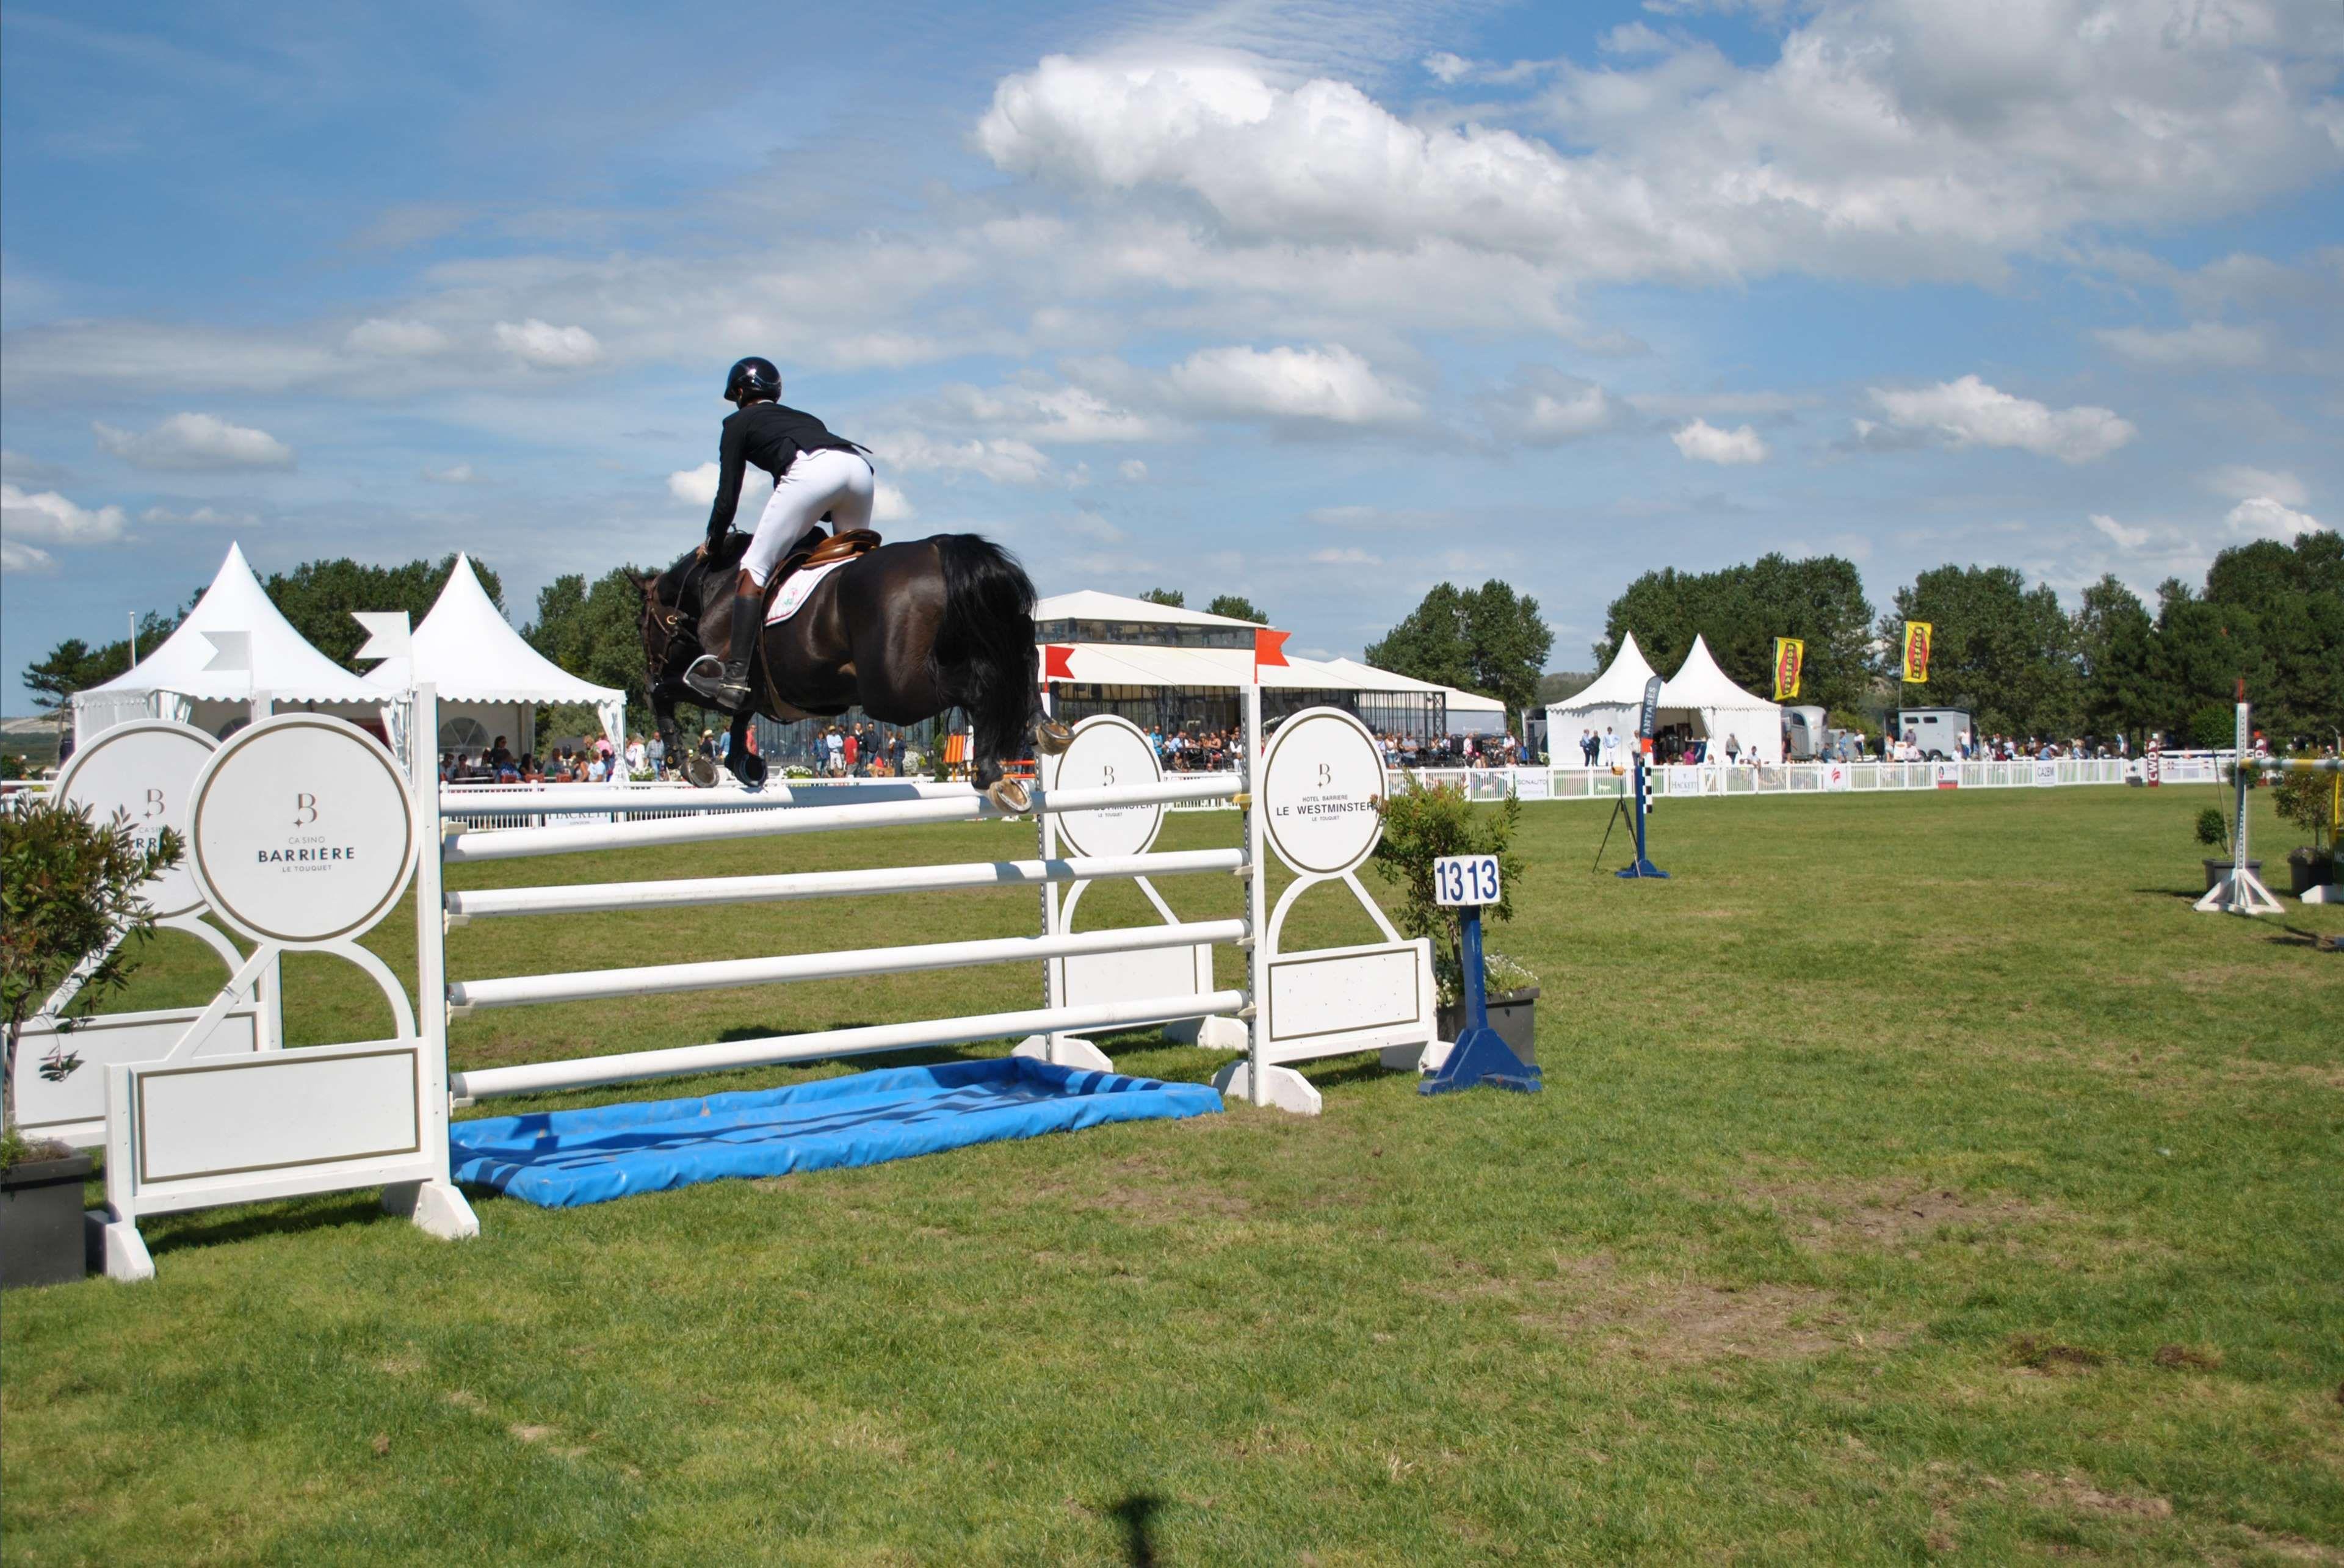 Clouds Hippodrome Horse Rider Jockey Jump Lawn Weekend Nice Day Obstacke 4k